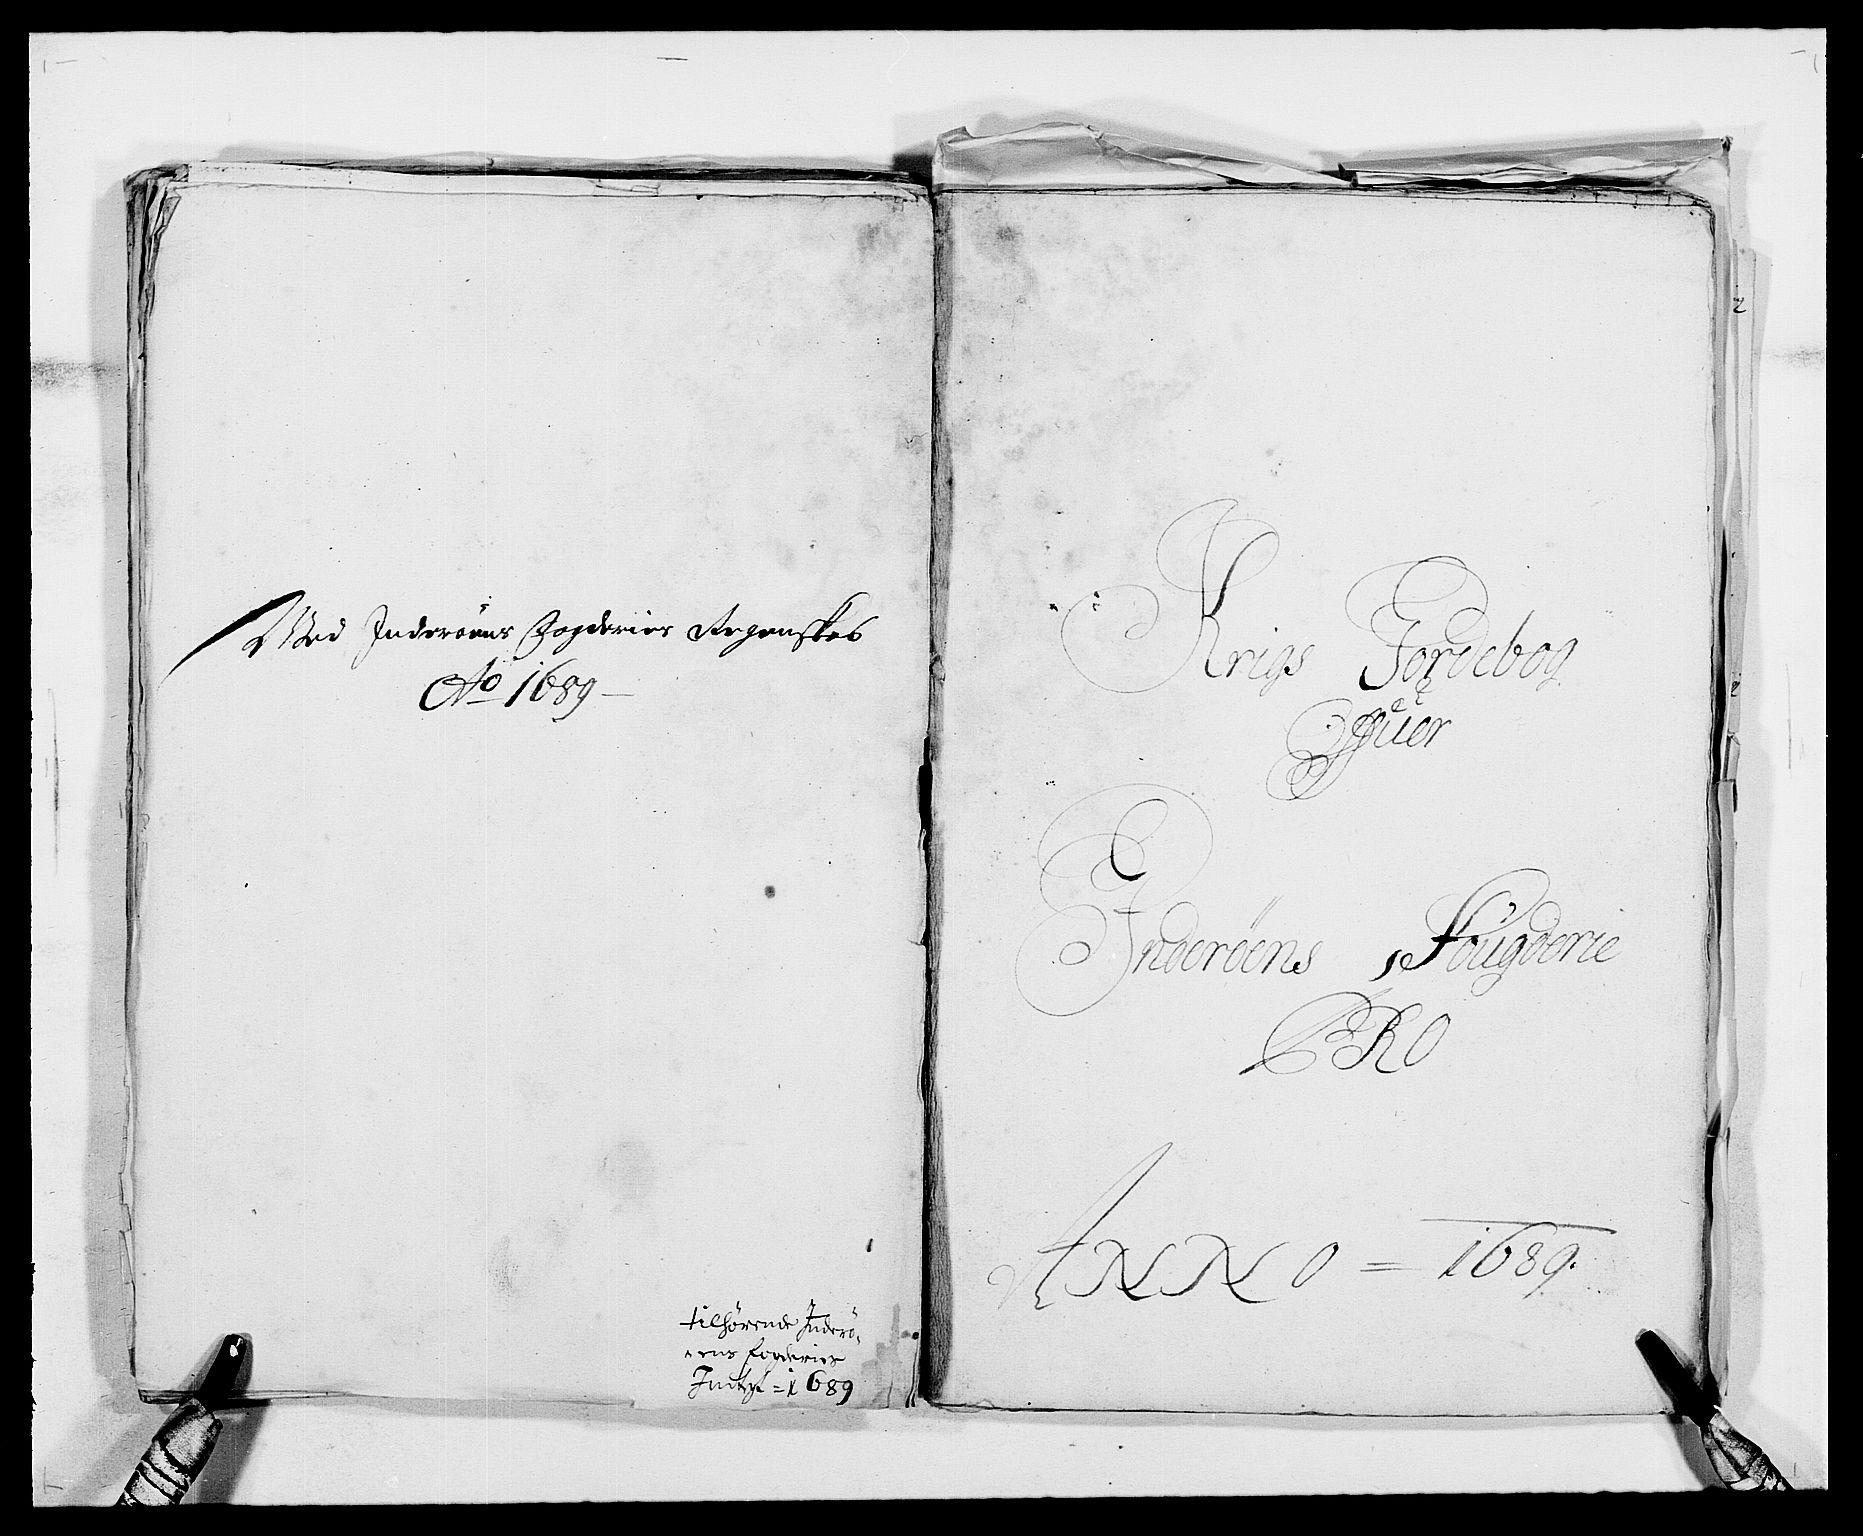 RA, Rentekammeret inntil 1814, Reviderte regnskaper, Fogderegnskap, R63/L4306: Fogderegnskap Inderøy, 1687-1689, s. 484